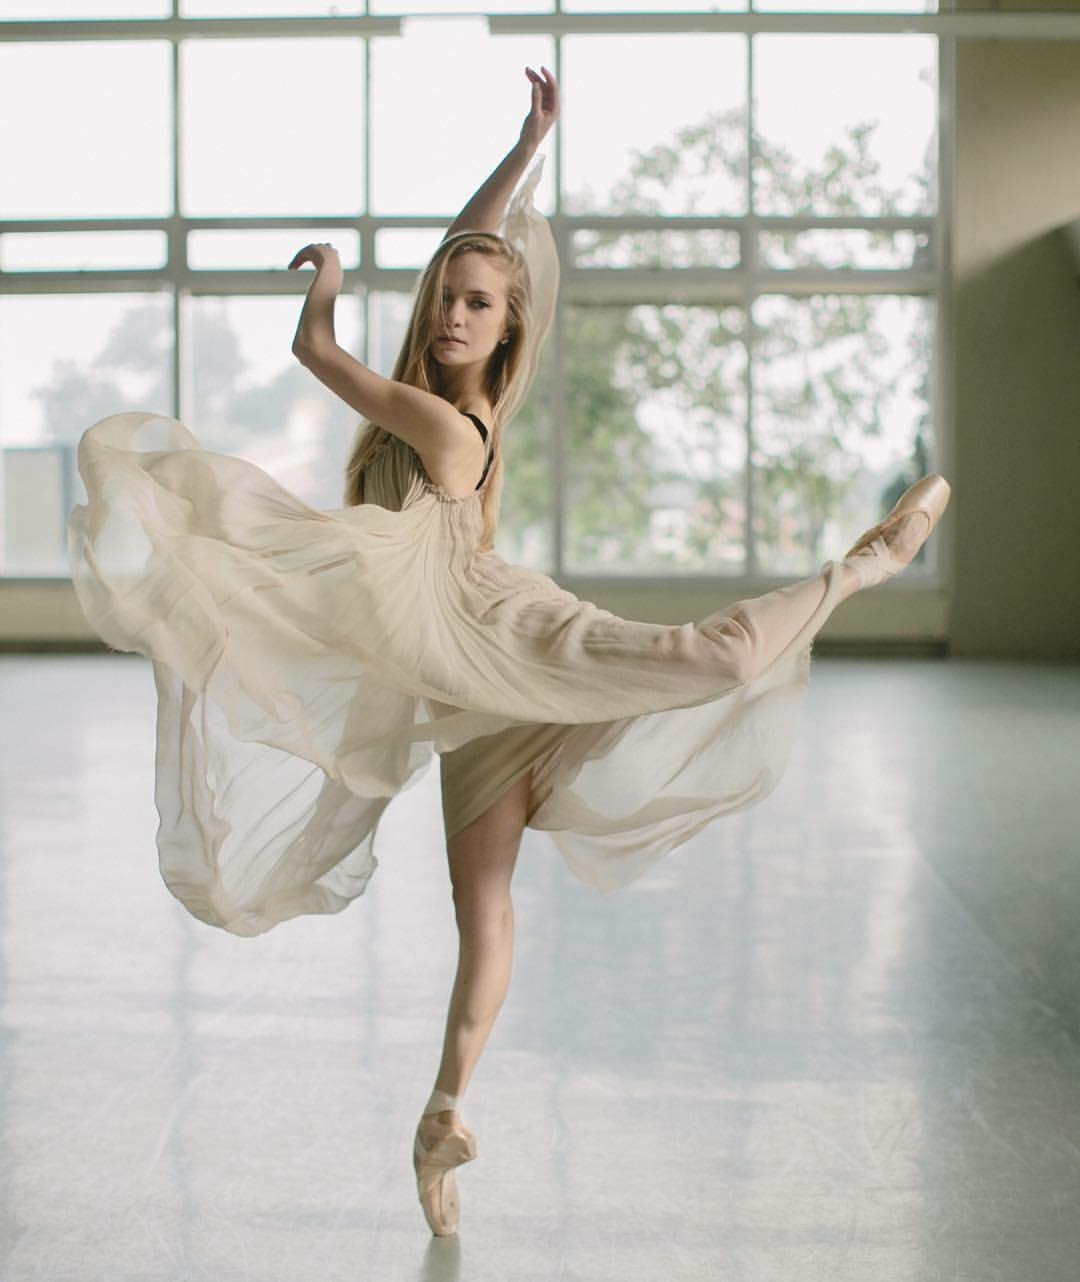 sasha de Sola of san francisco ballet. photographed by karolina kuras